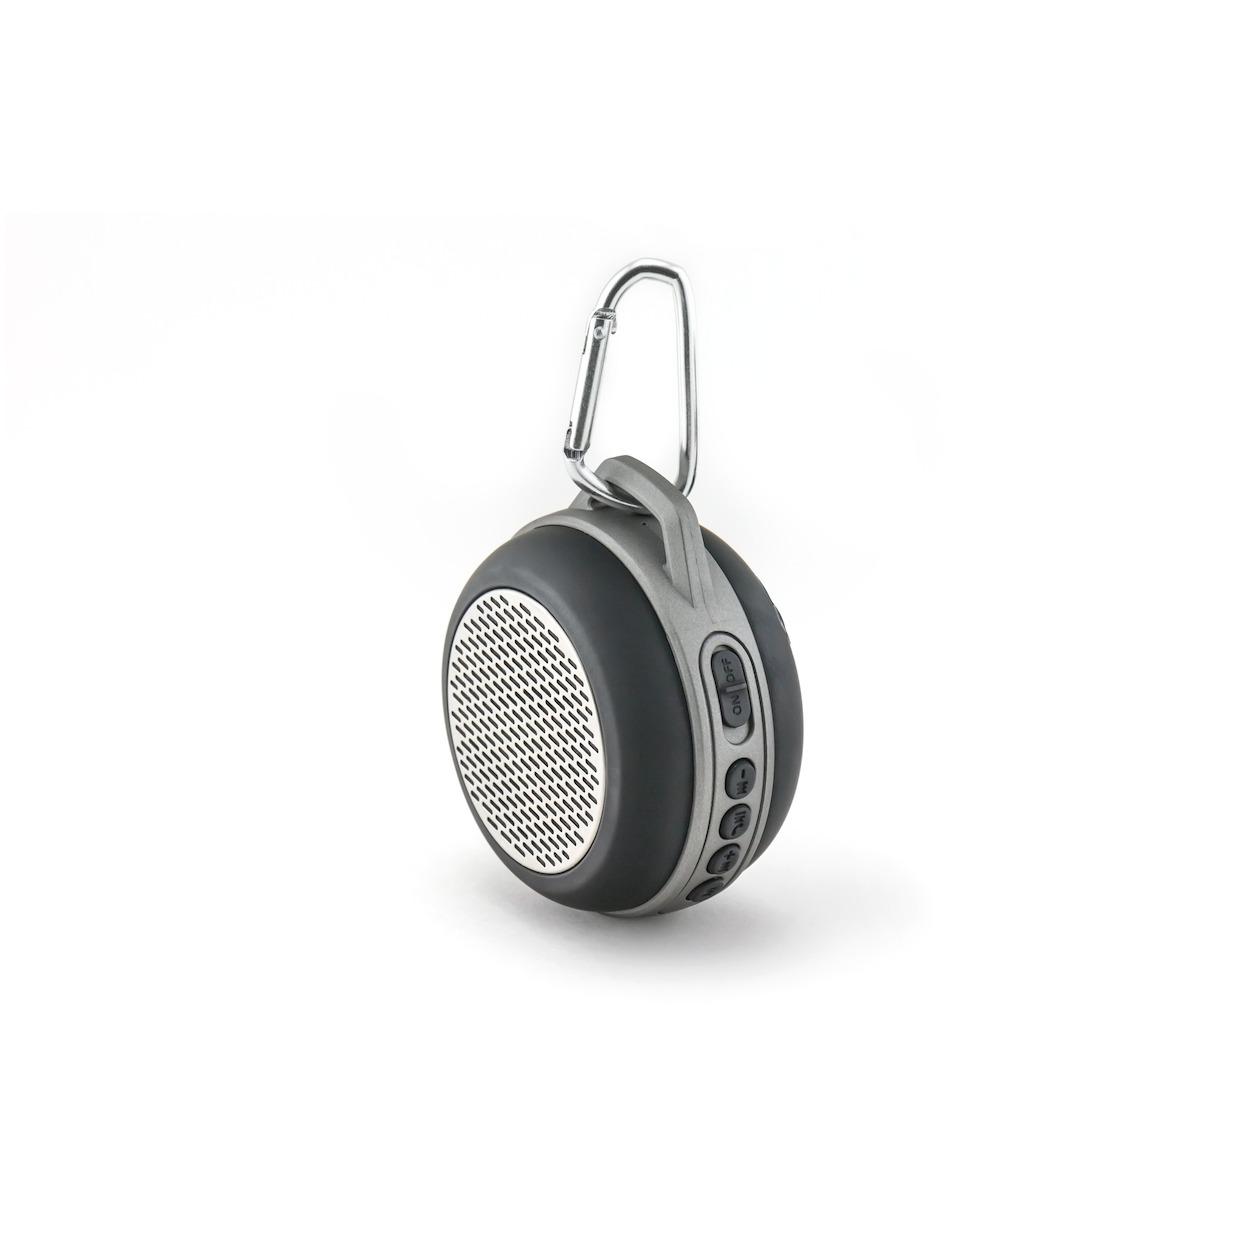 Caliber bluetooth speaker HPG326BT